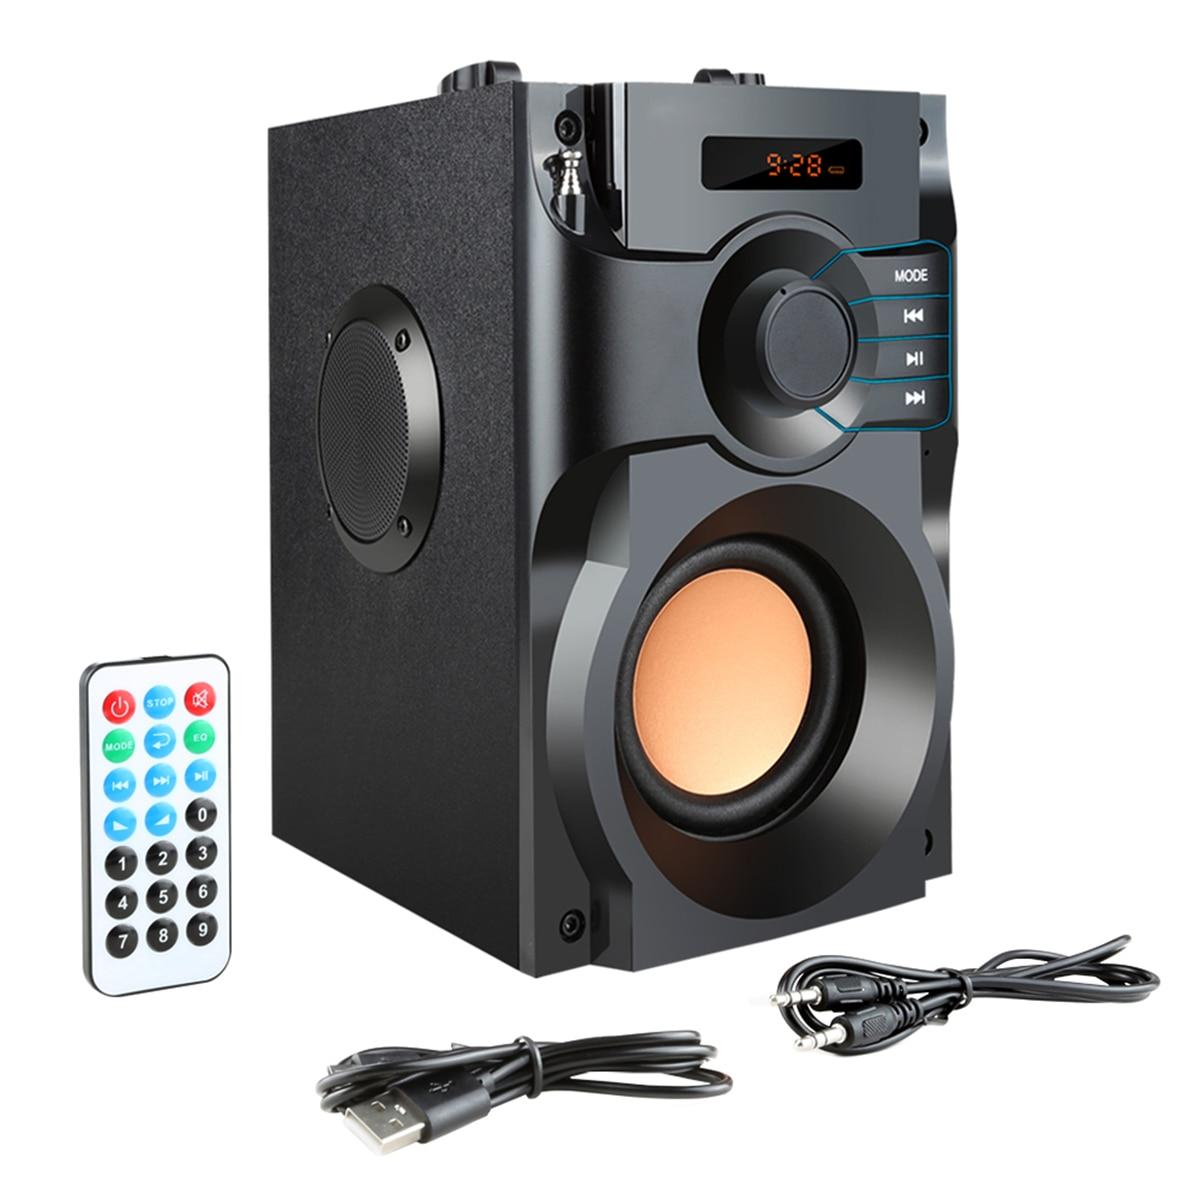 Outdoor Bluetooth Speaker Stereo Wireless Box Sound Bluetooth Subwoofer Soundbar Box FM TF AUX + Remote Control Speaker rushed plastic soundbar portable bluetooth speaker power sound stereo audio box outdoor sports hifi music fm tf phone xtreme